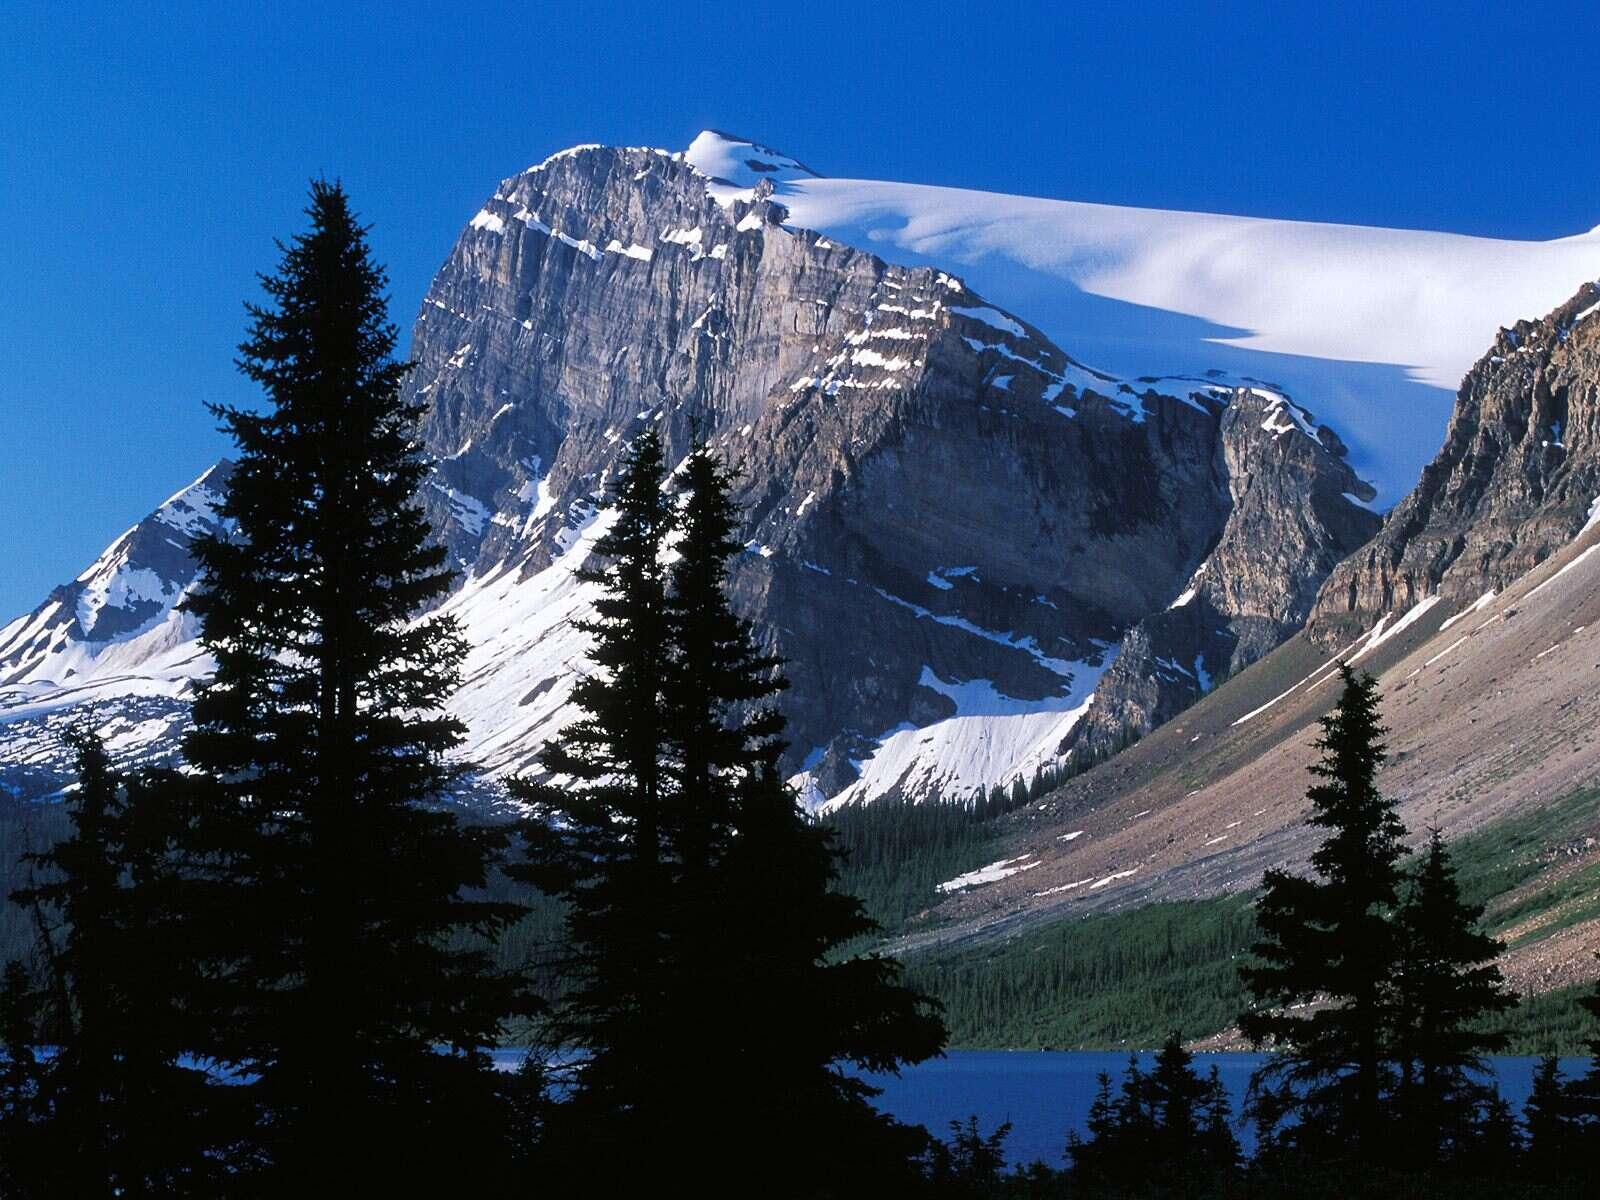 Ice field, Banff National Park